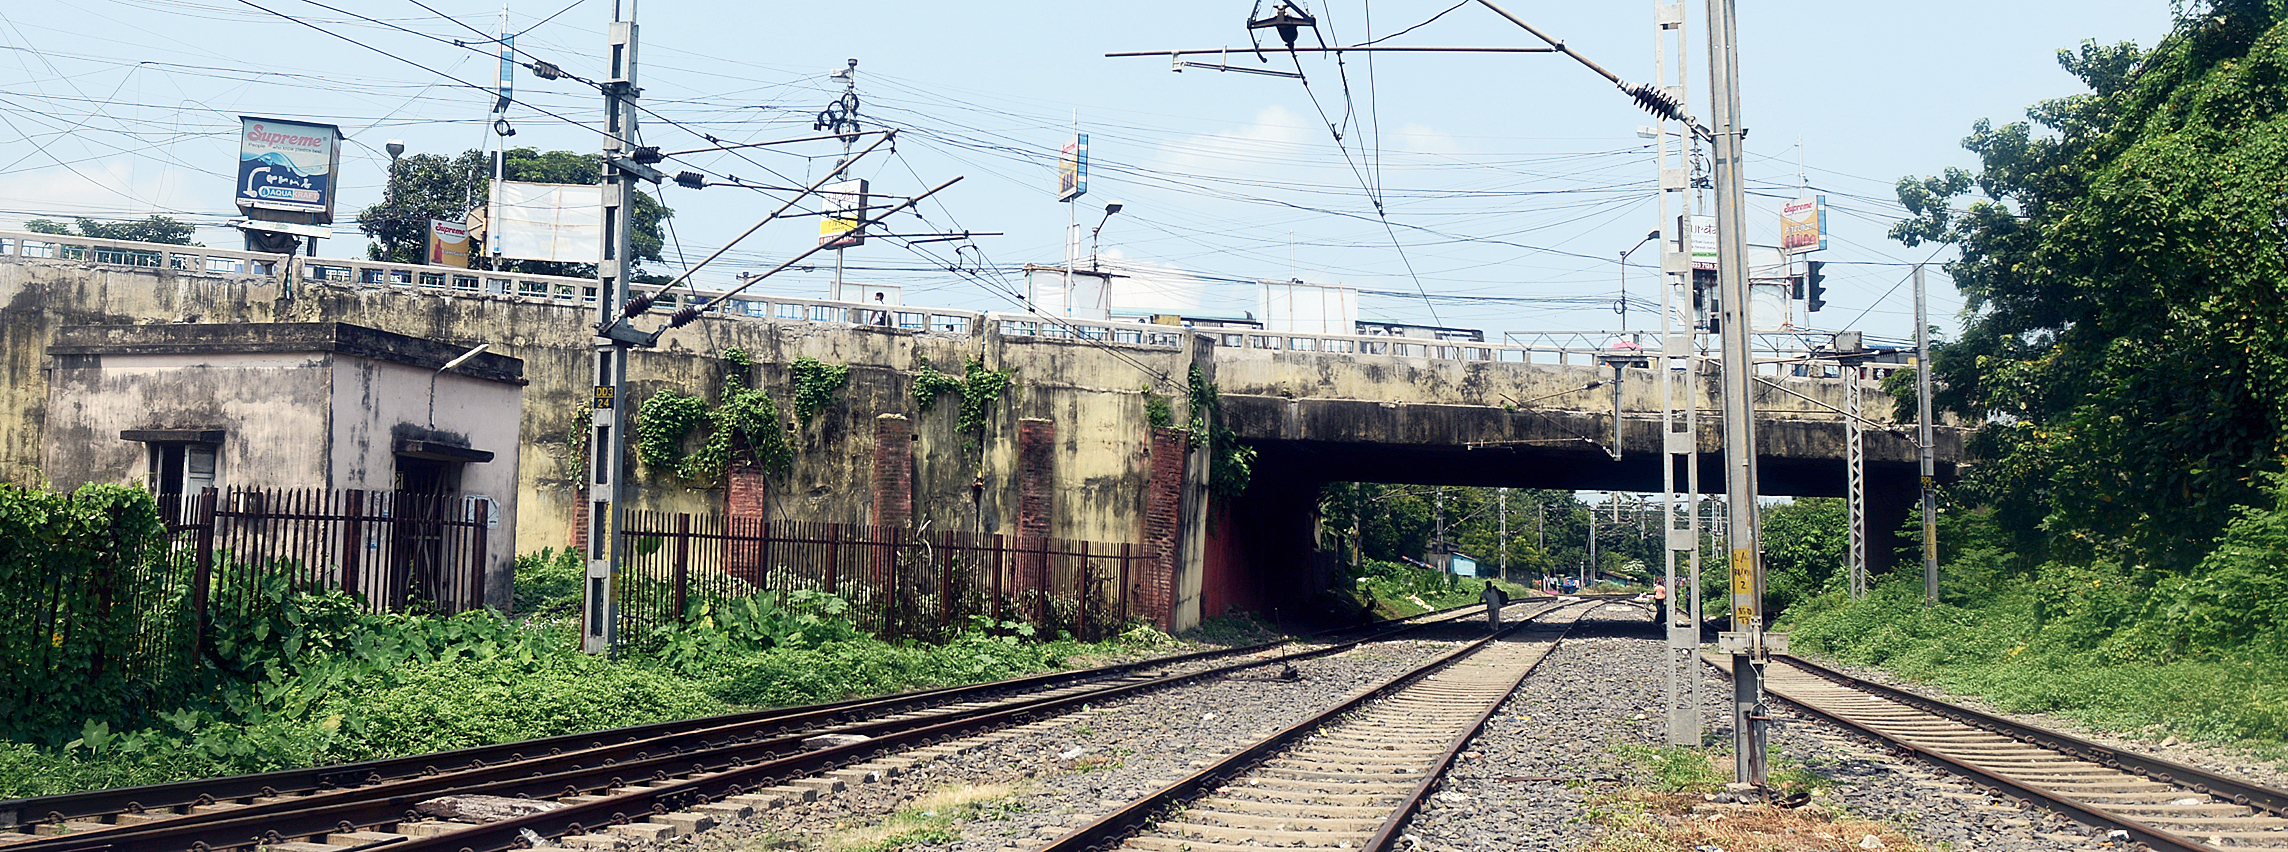 The Tallah bridge and the railway tracks that run under it